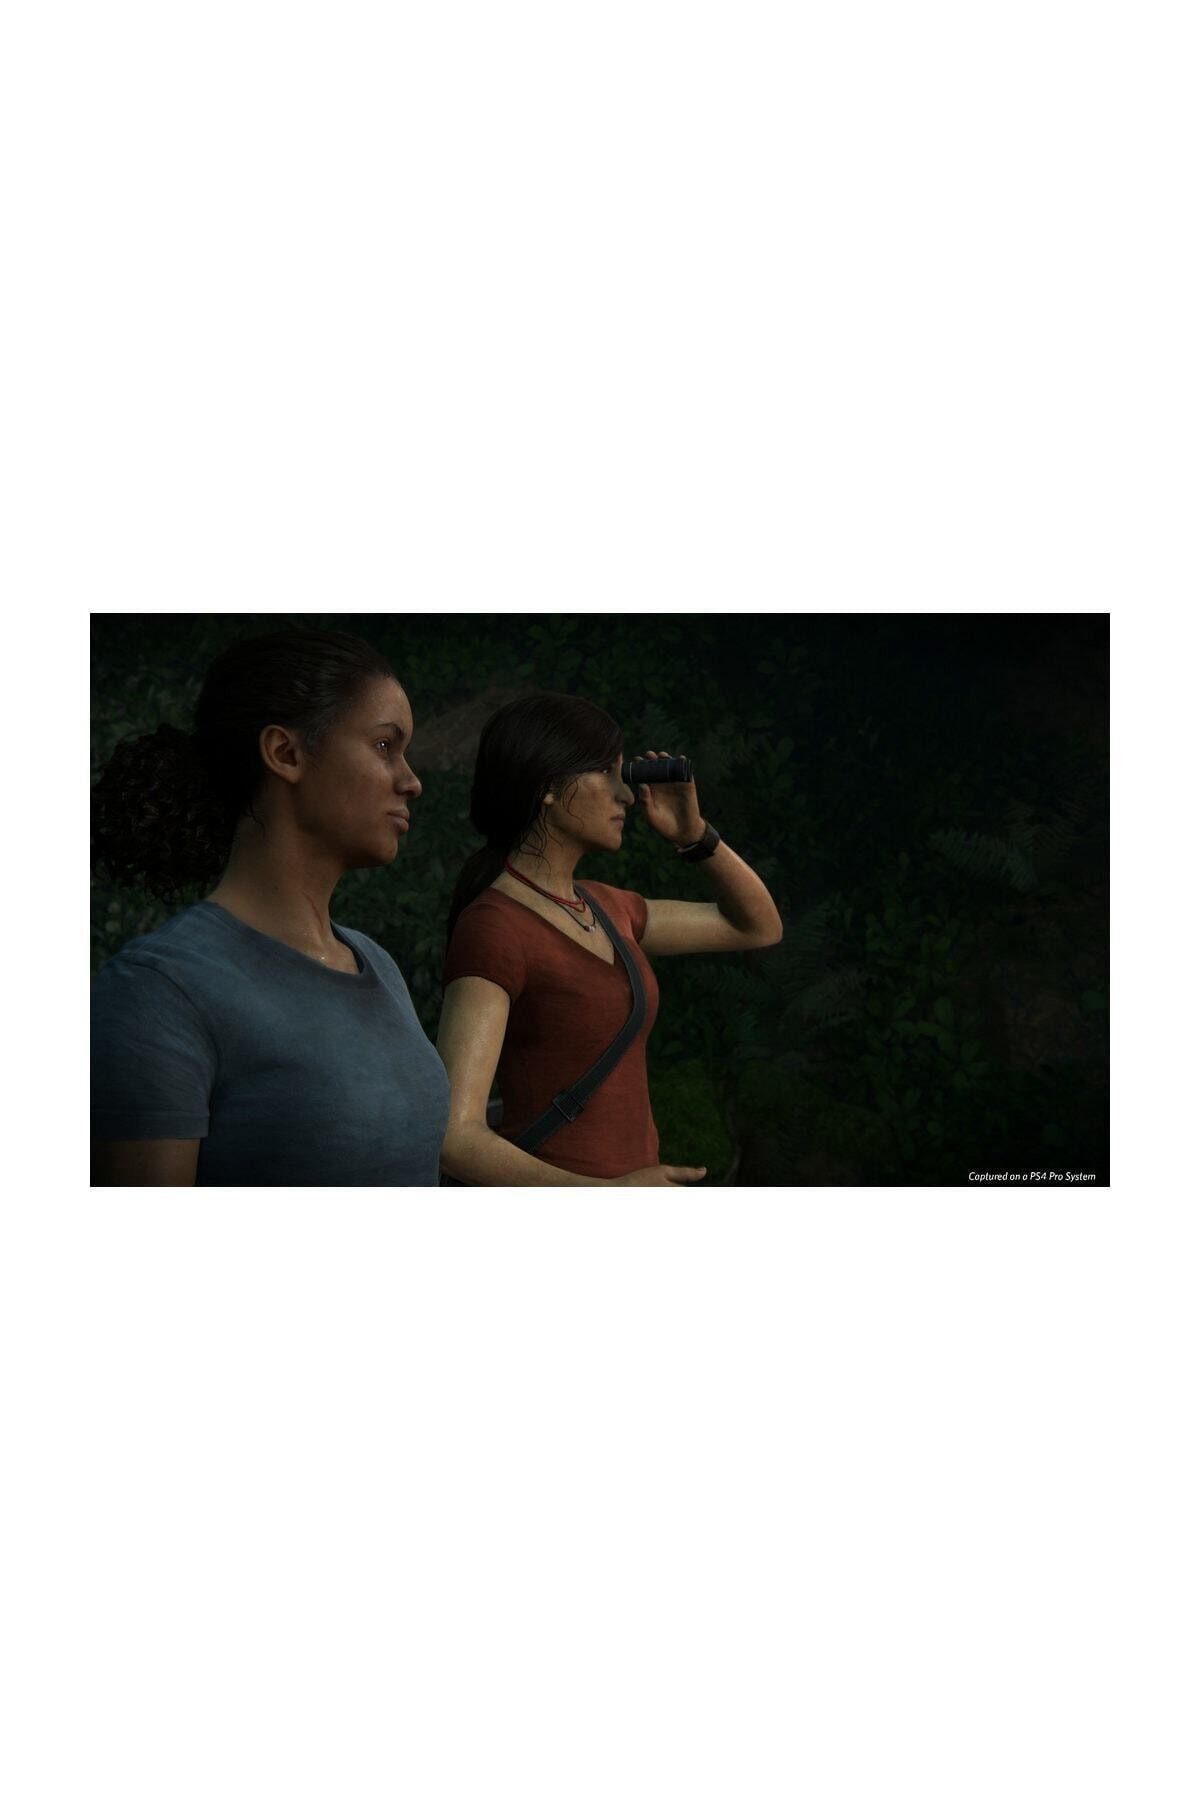 Naughty Dog Uncharted Kayıp Miras  - Türkçe Dublaj Ps4 Oyun 2